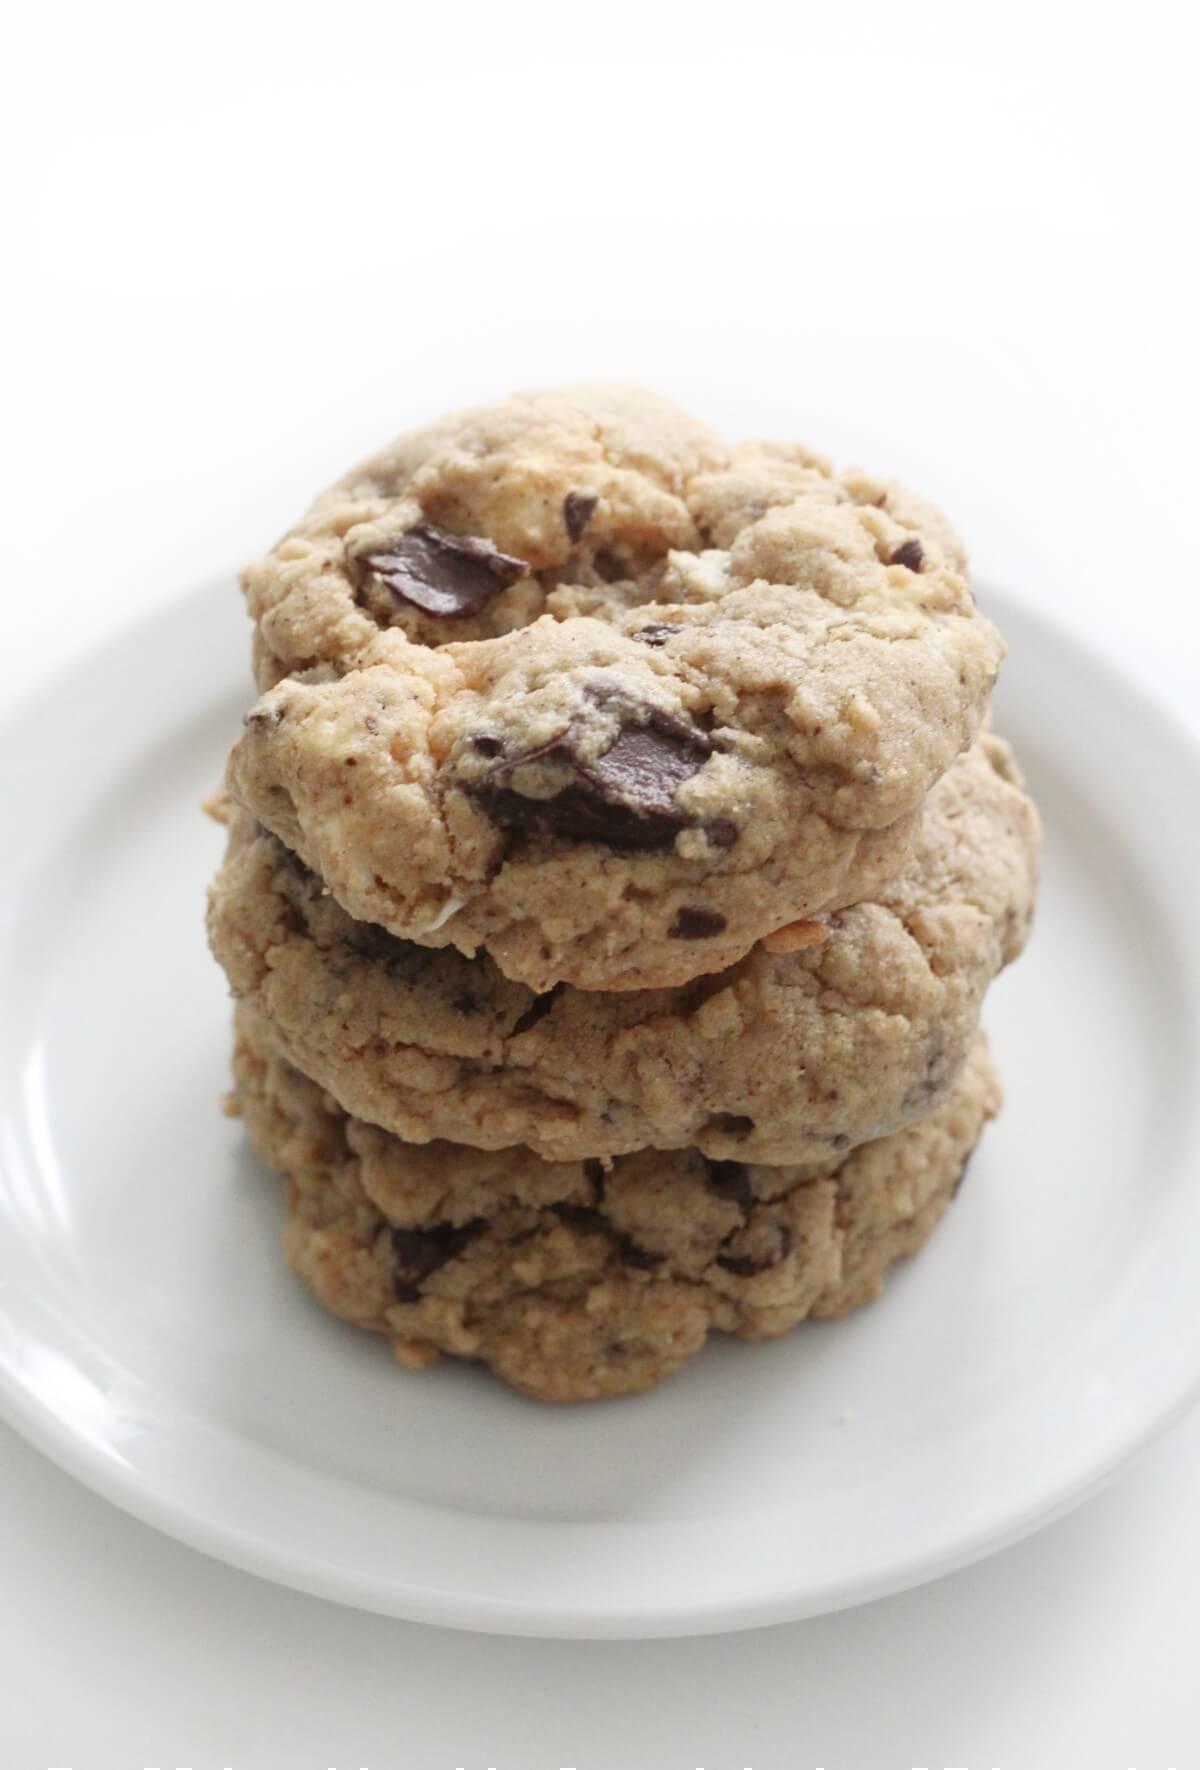 stack of 3 vegan s'mores cookies